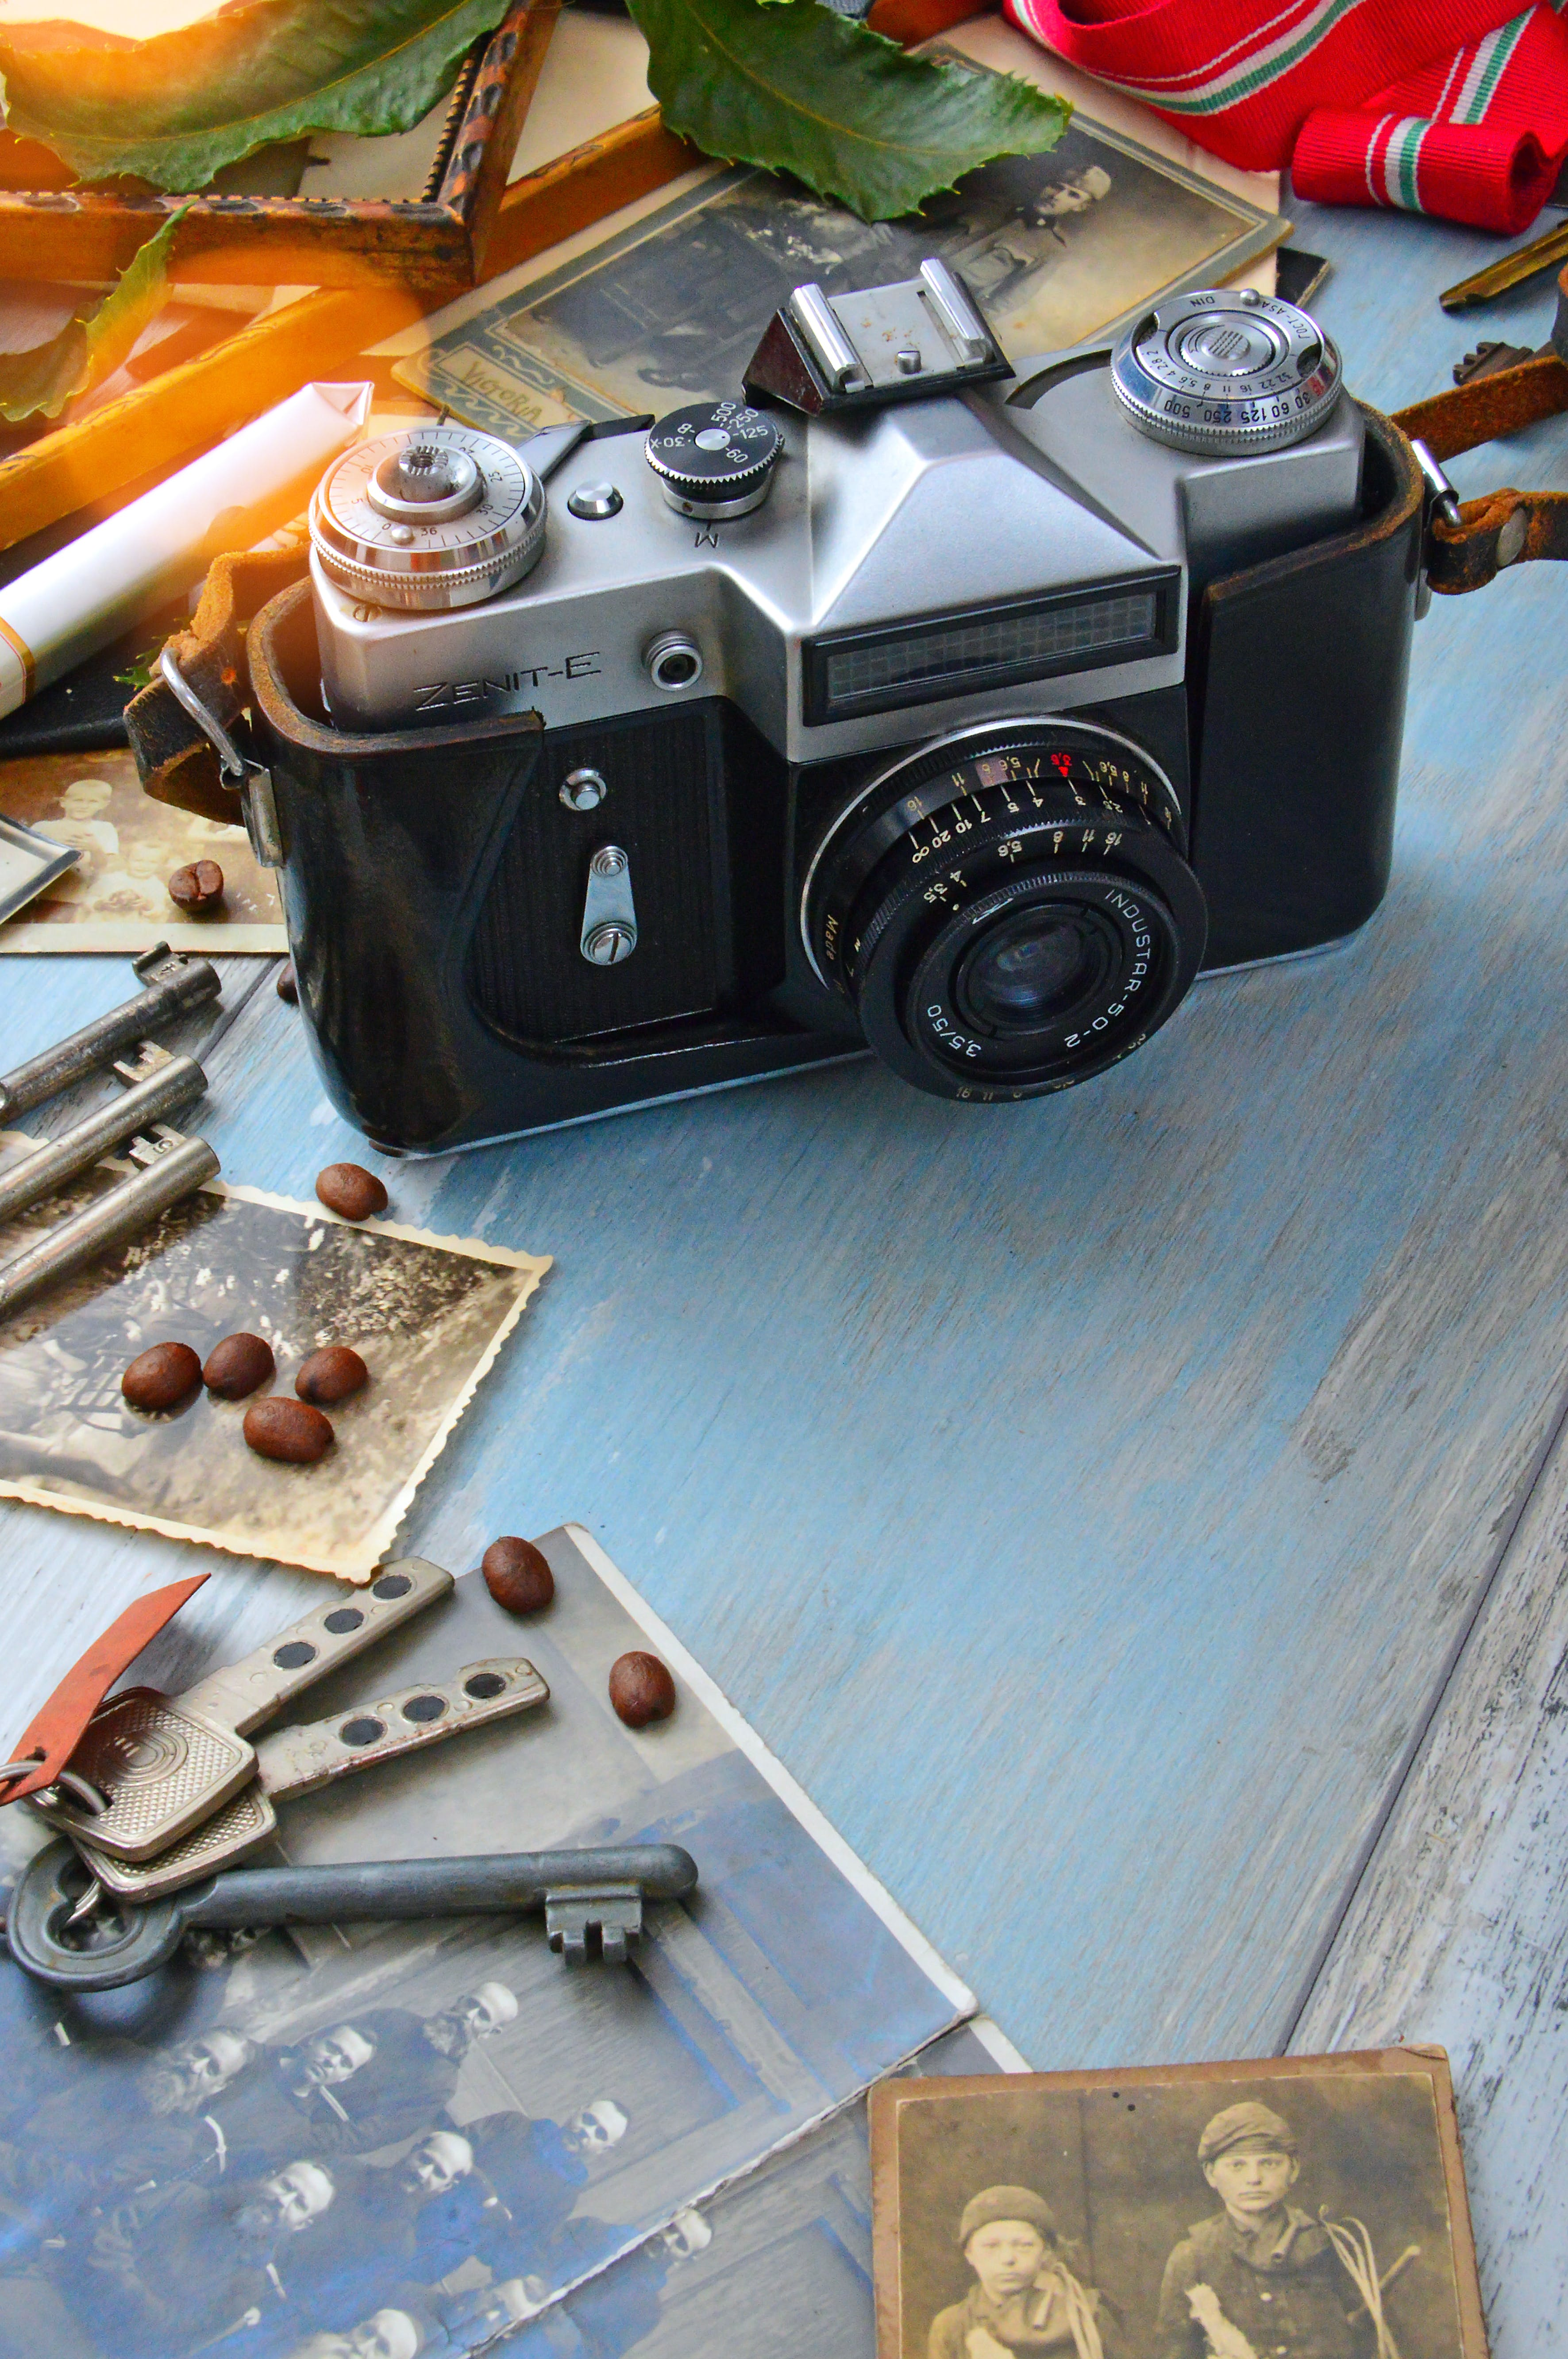 Black Film Camera on Blue Wooden Surface